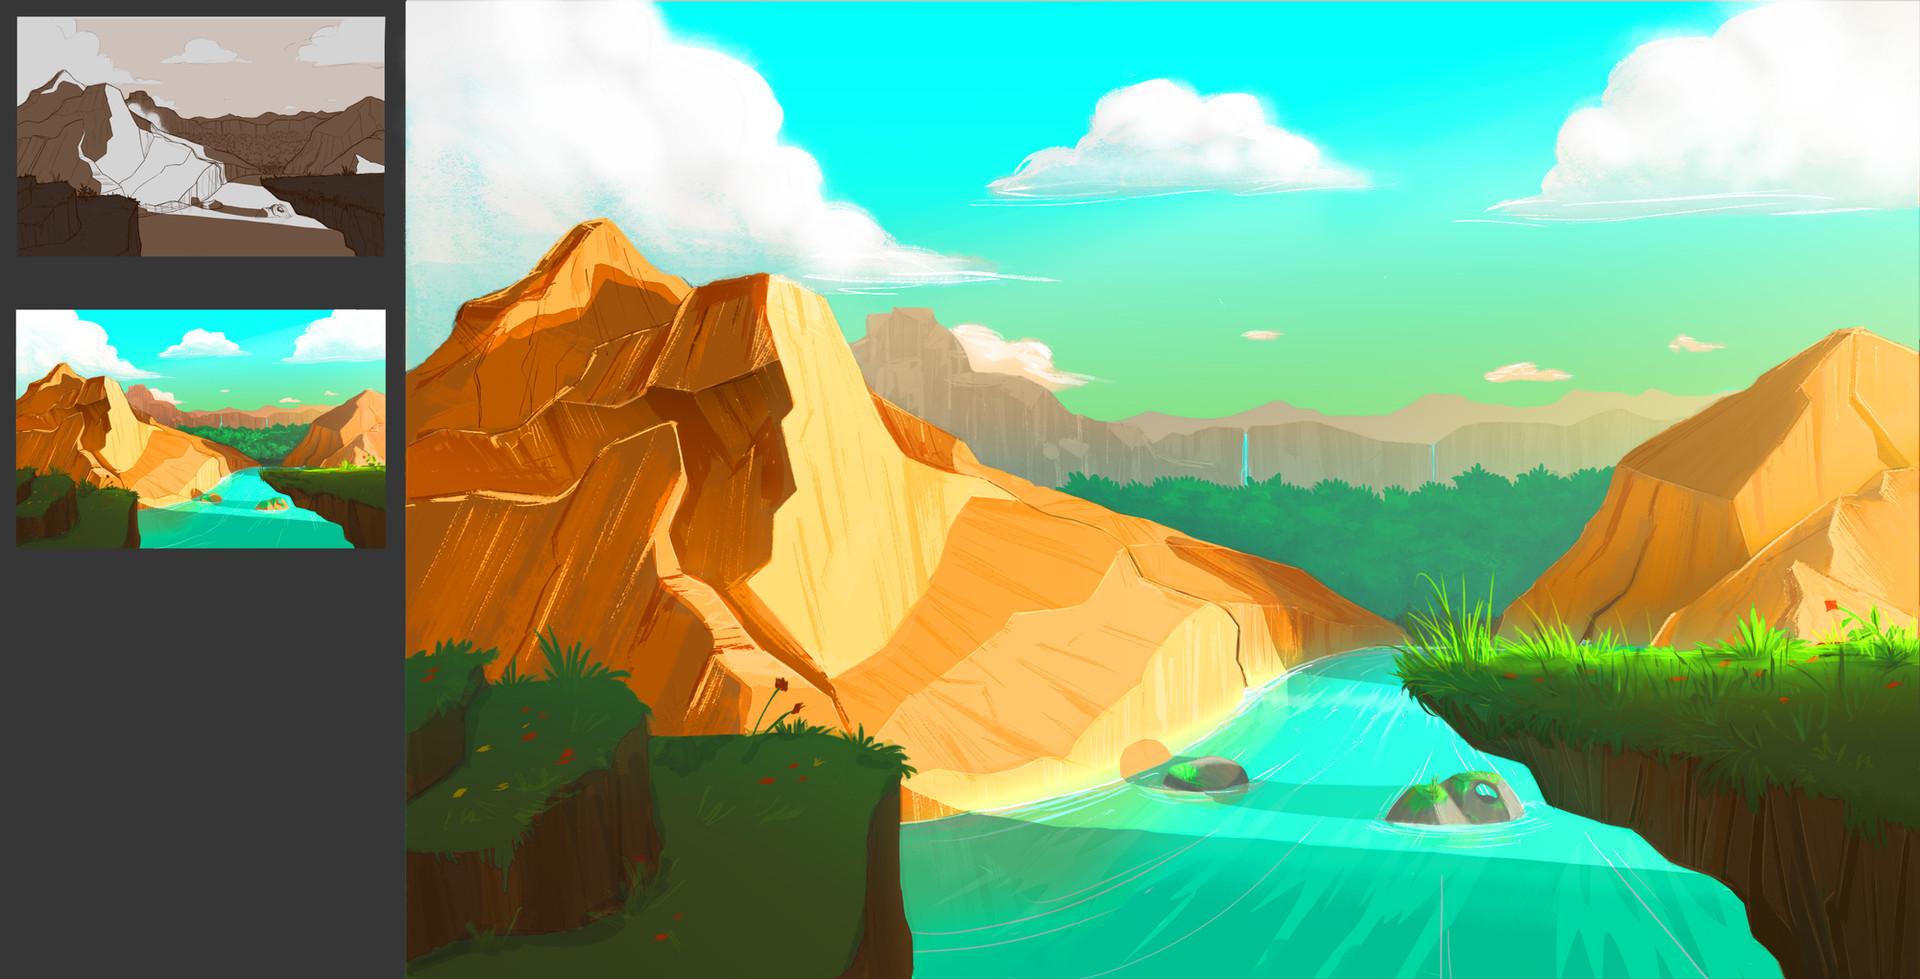 The Crey Mountains